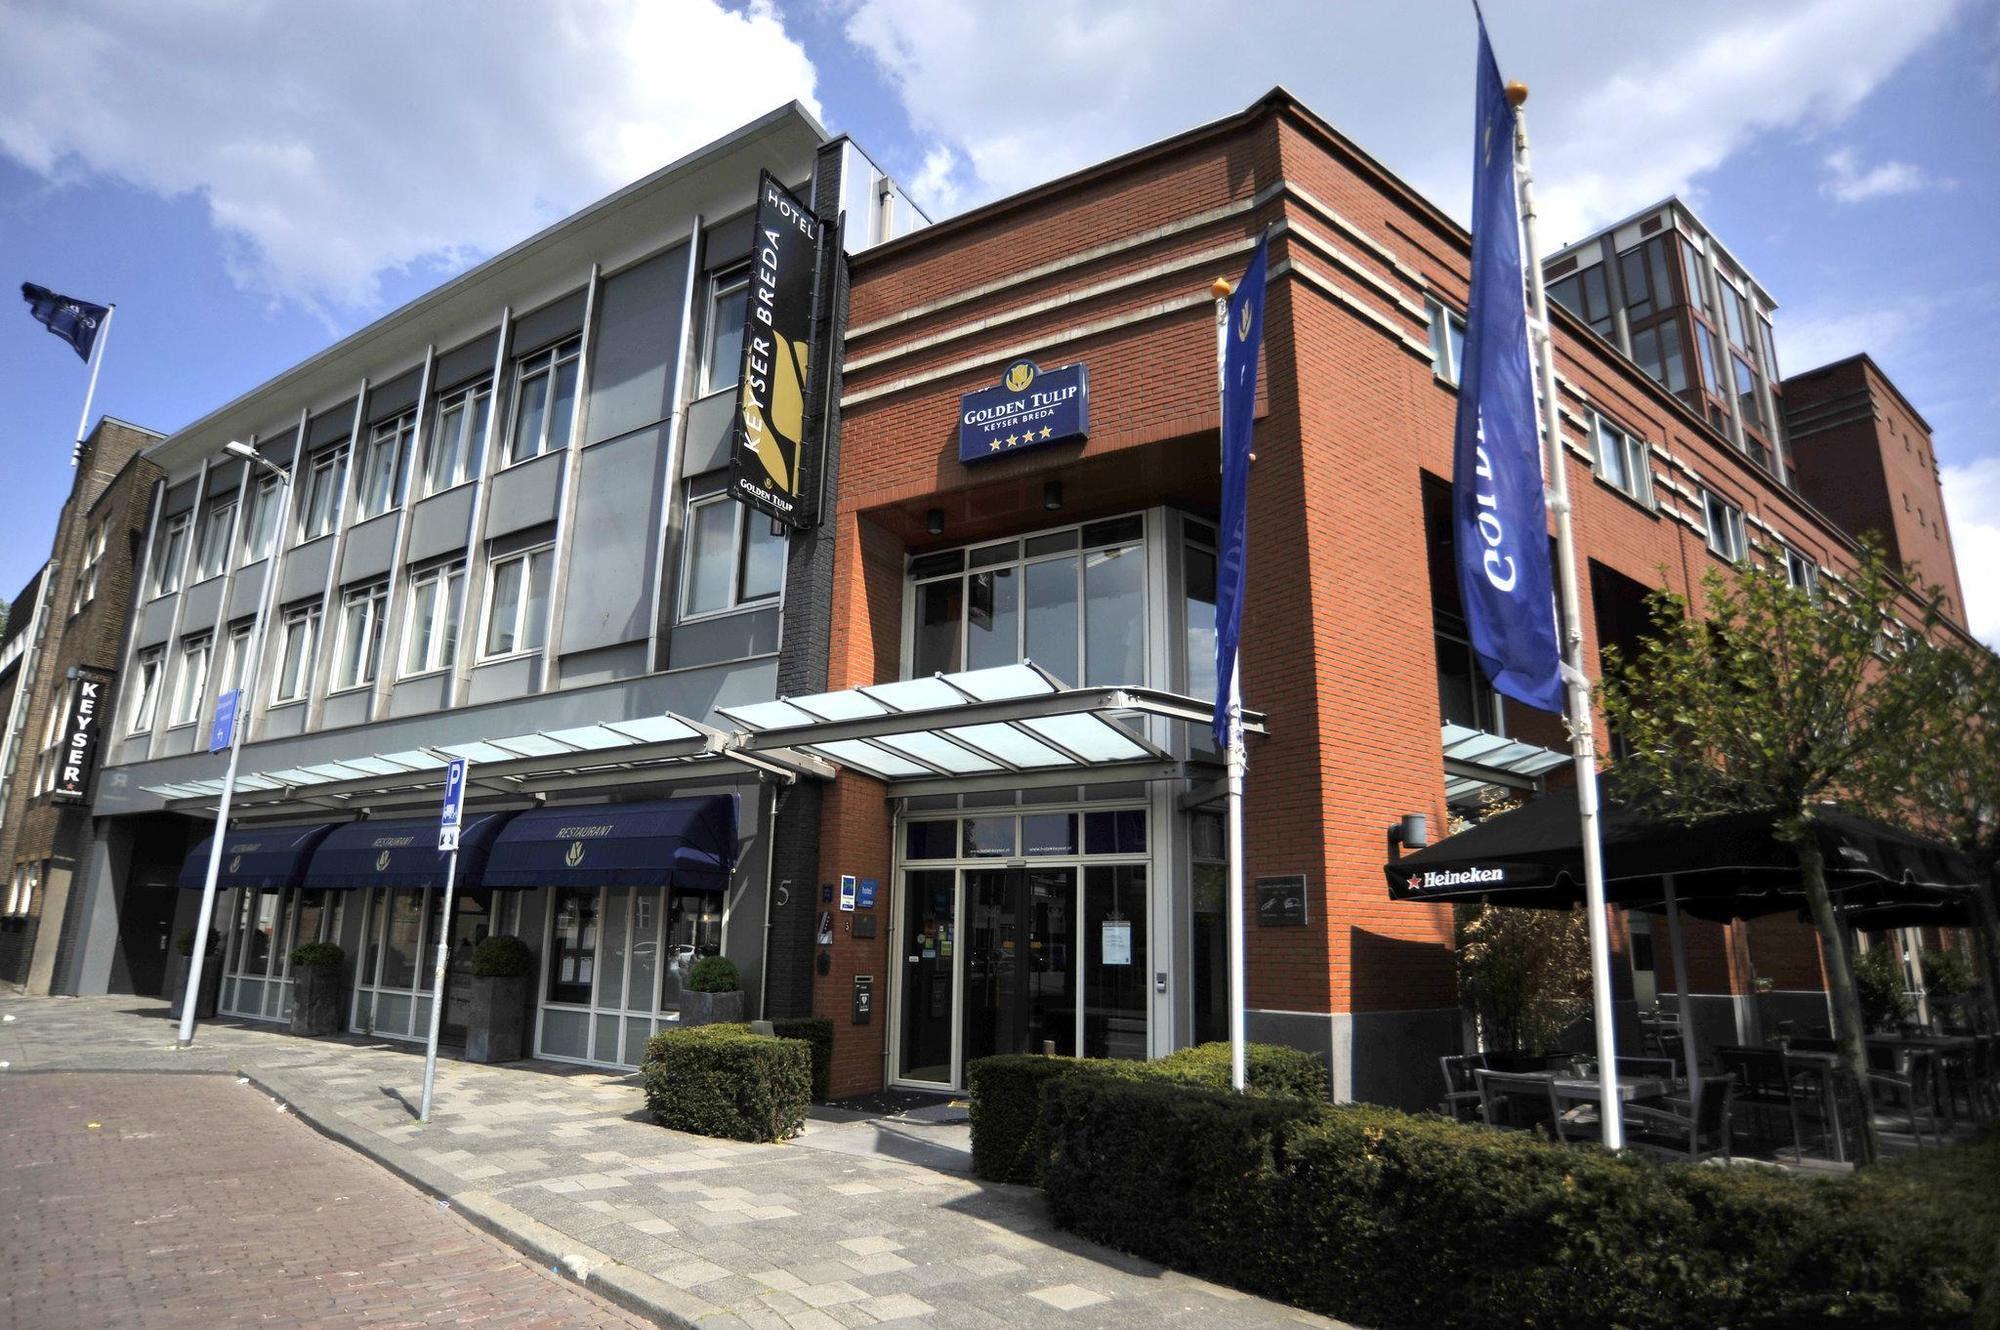 Breda Hotel Keyser